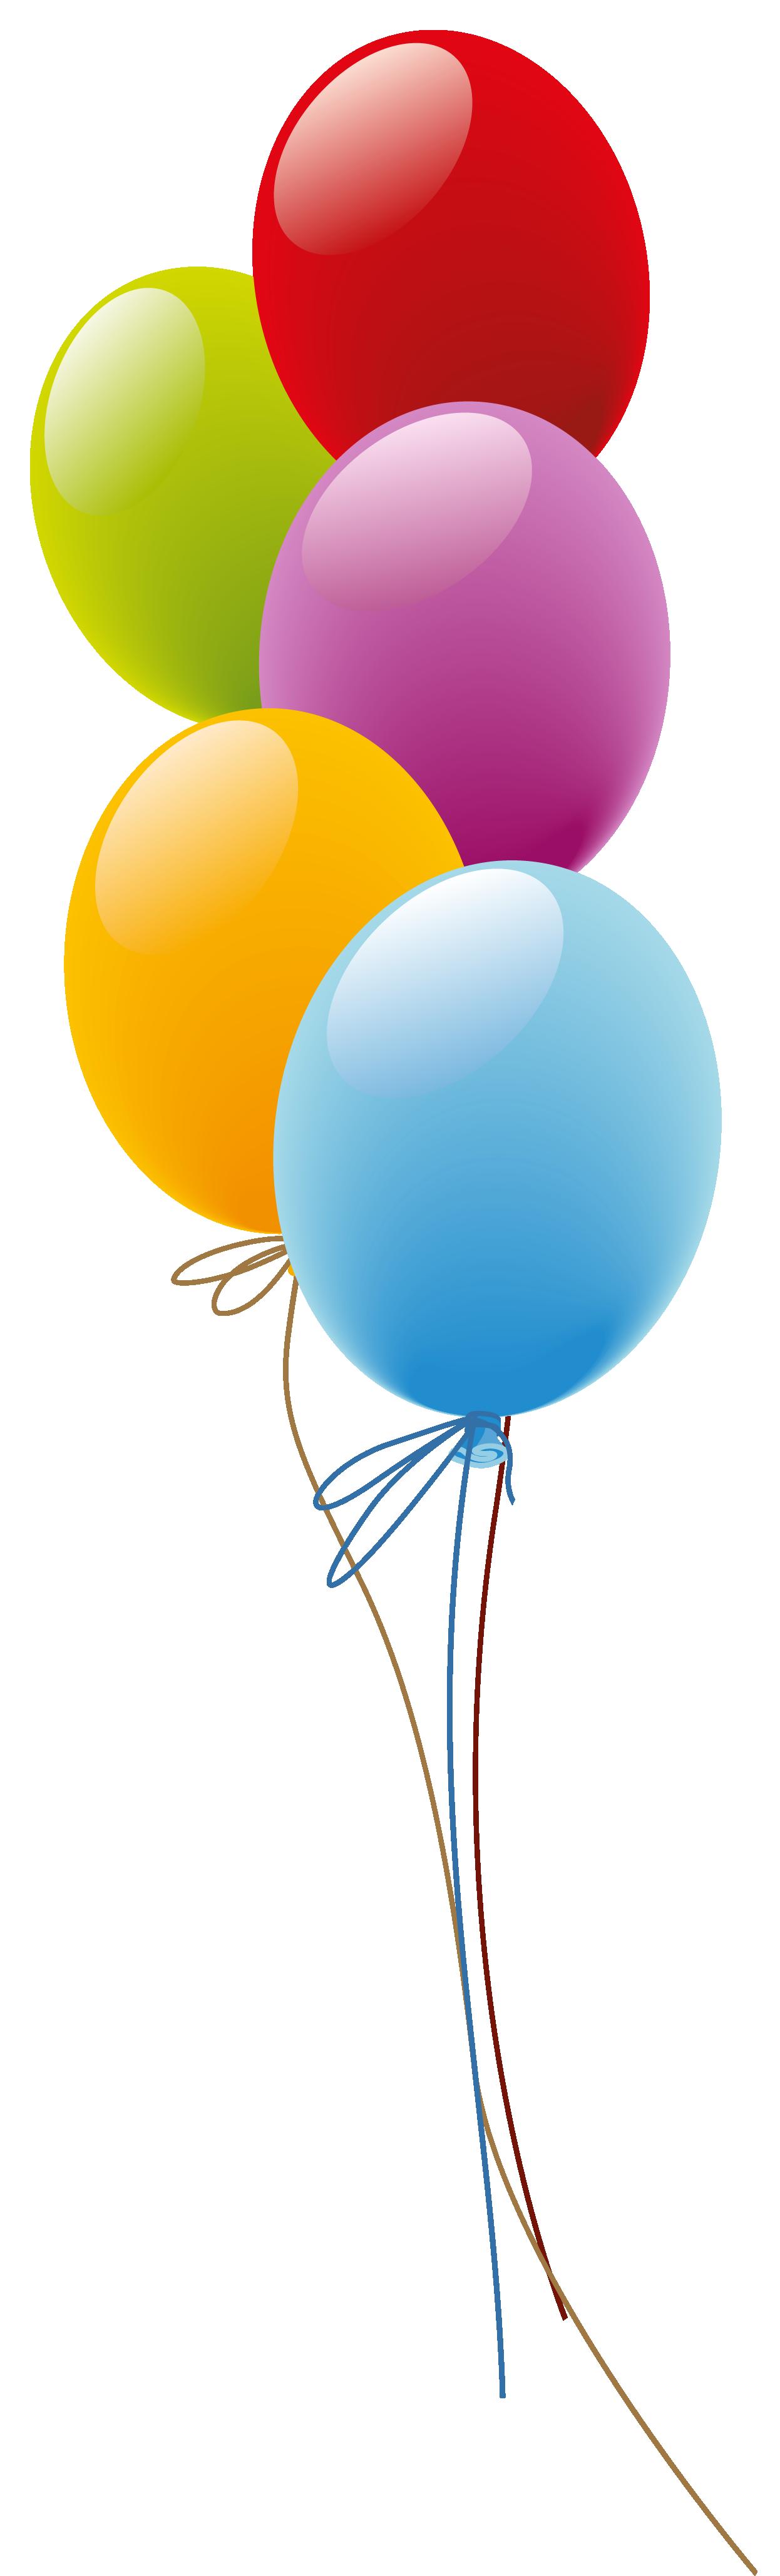 1246x4117 Balloons Png Picture Kunterbunt Birthdays, Happy